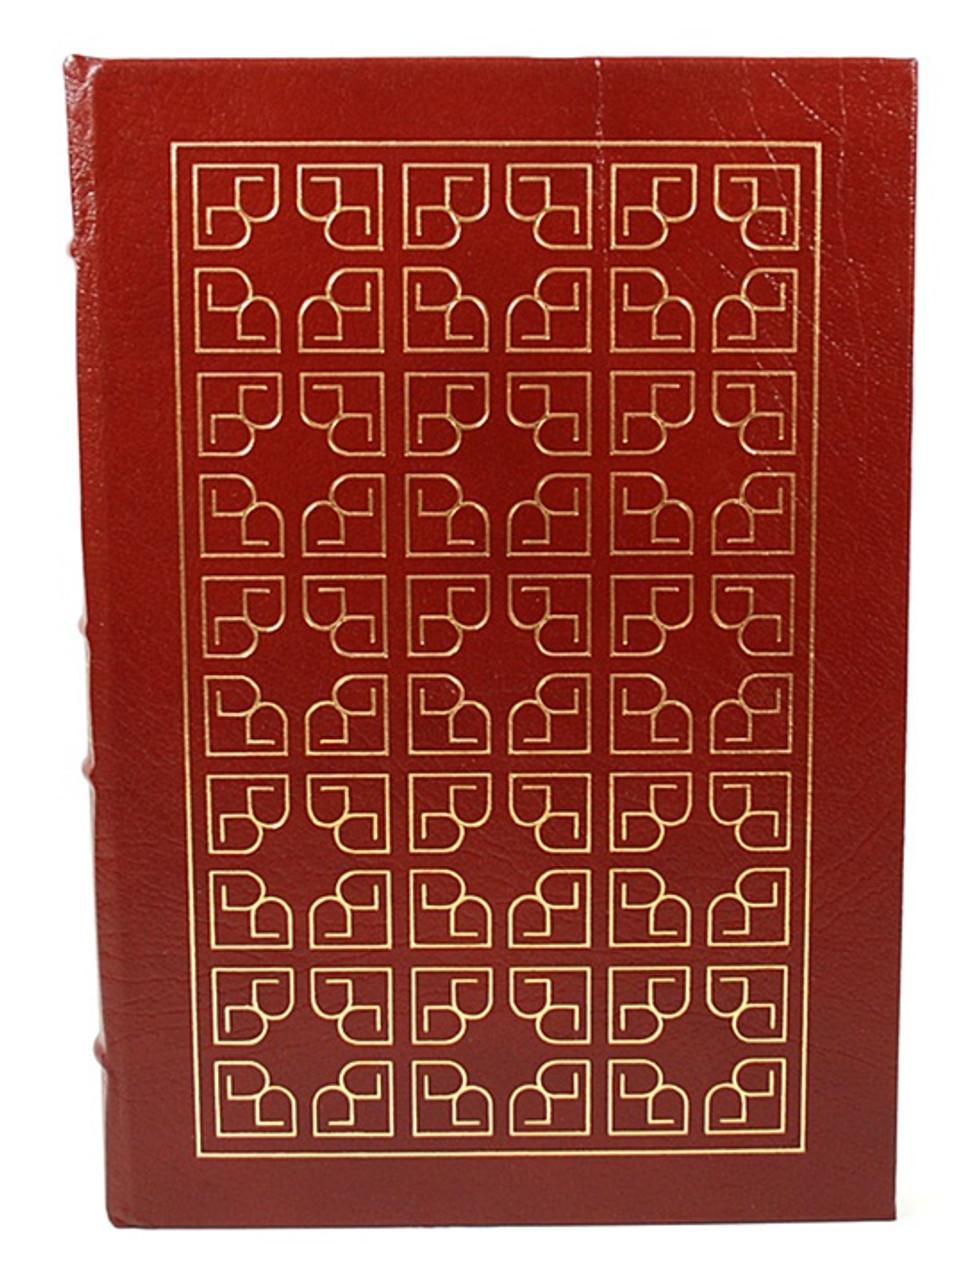 Easton Press 'Pudd'nhead Wilson' Mark Twain, Leather Bound Collector's Edition